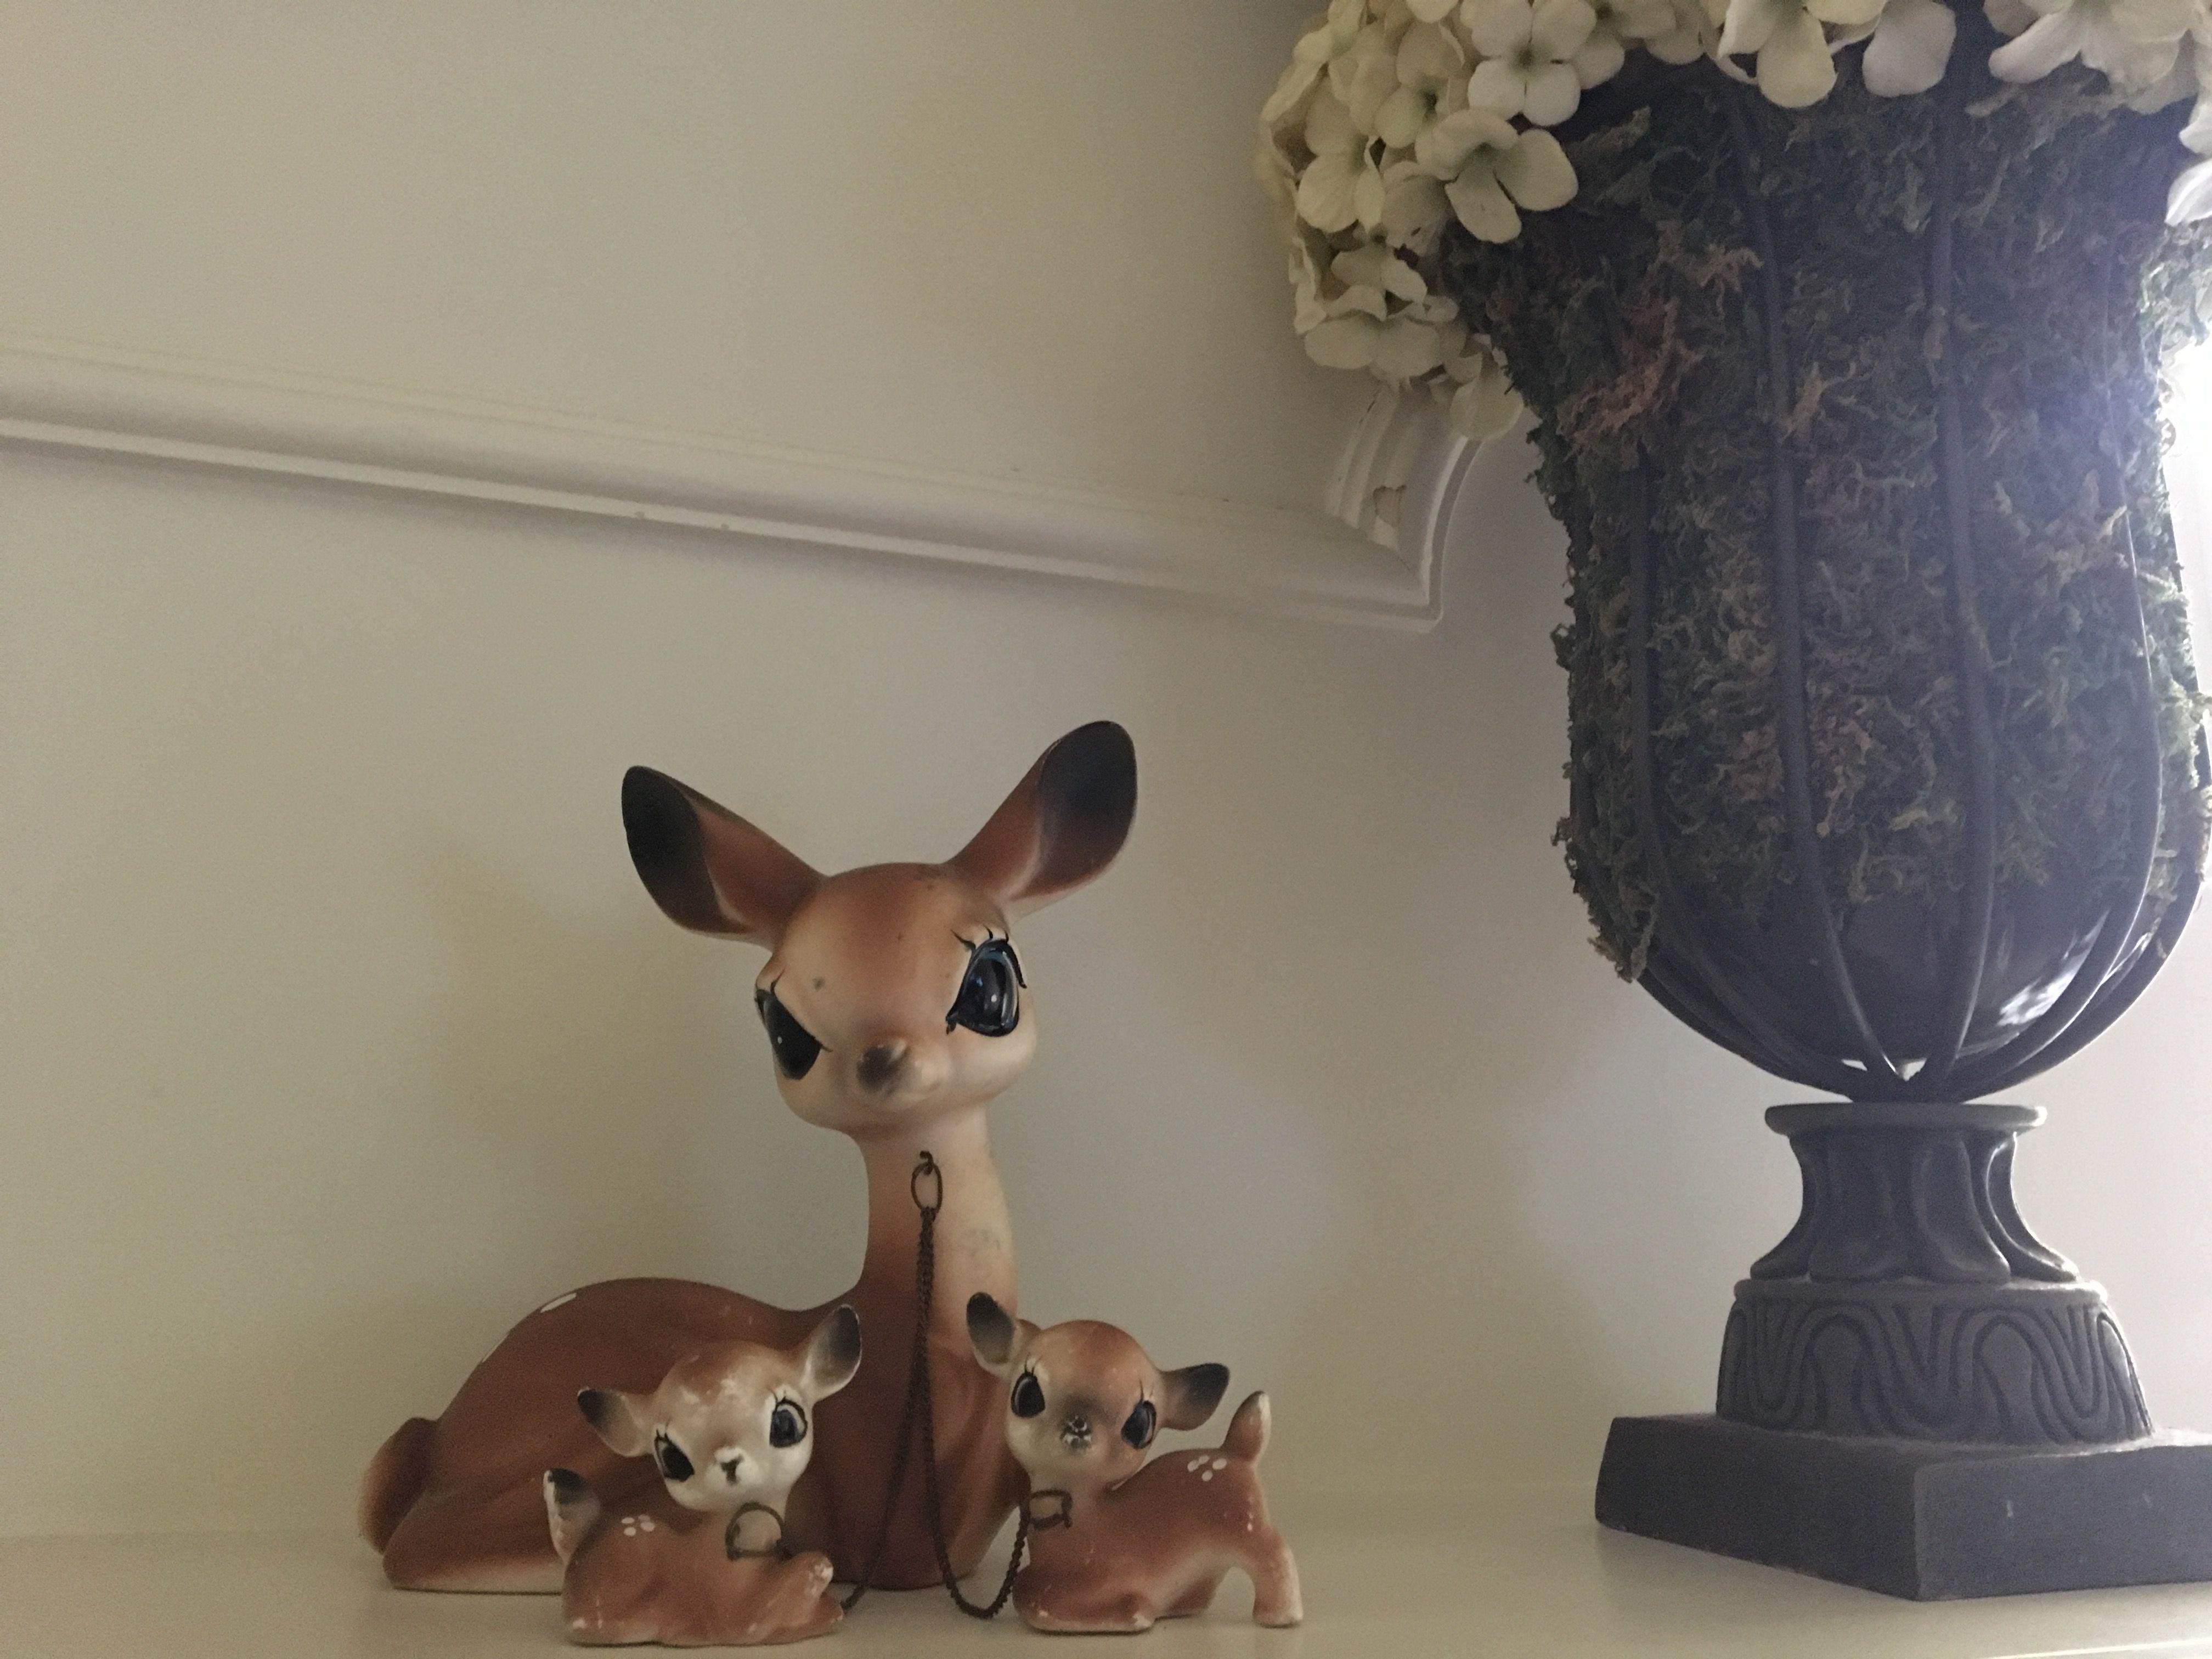 Wales Deer Made in Japan.  Found on etsy VintageAcorn70 shop.